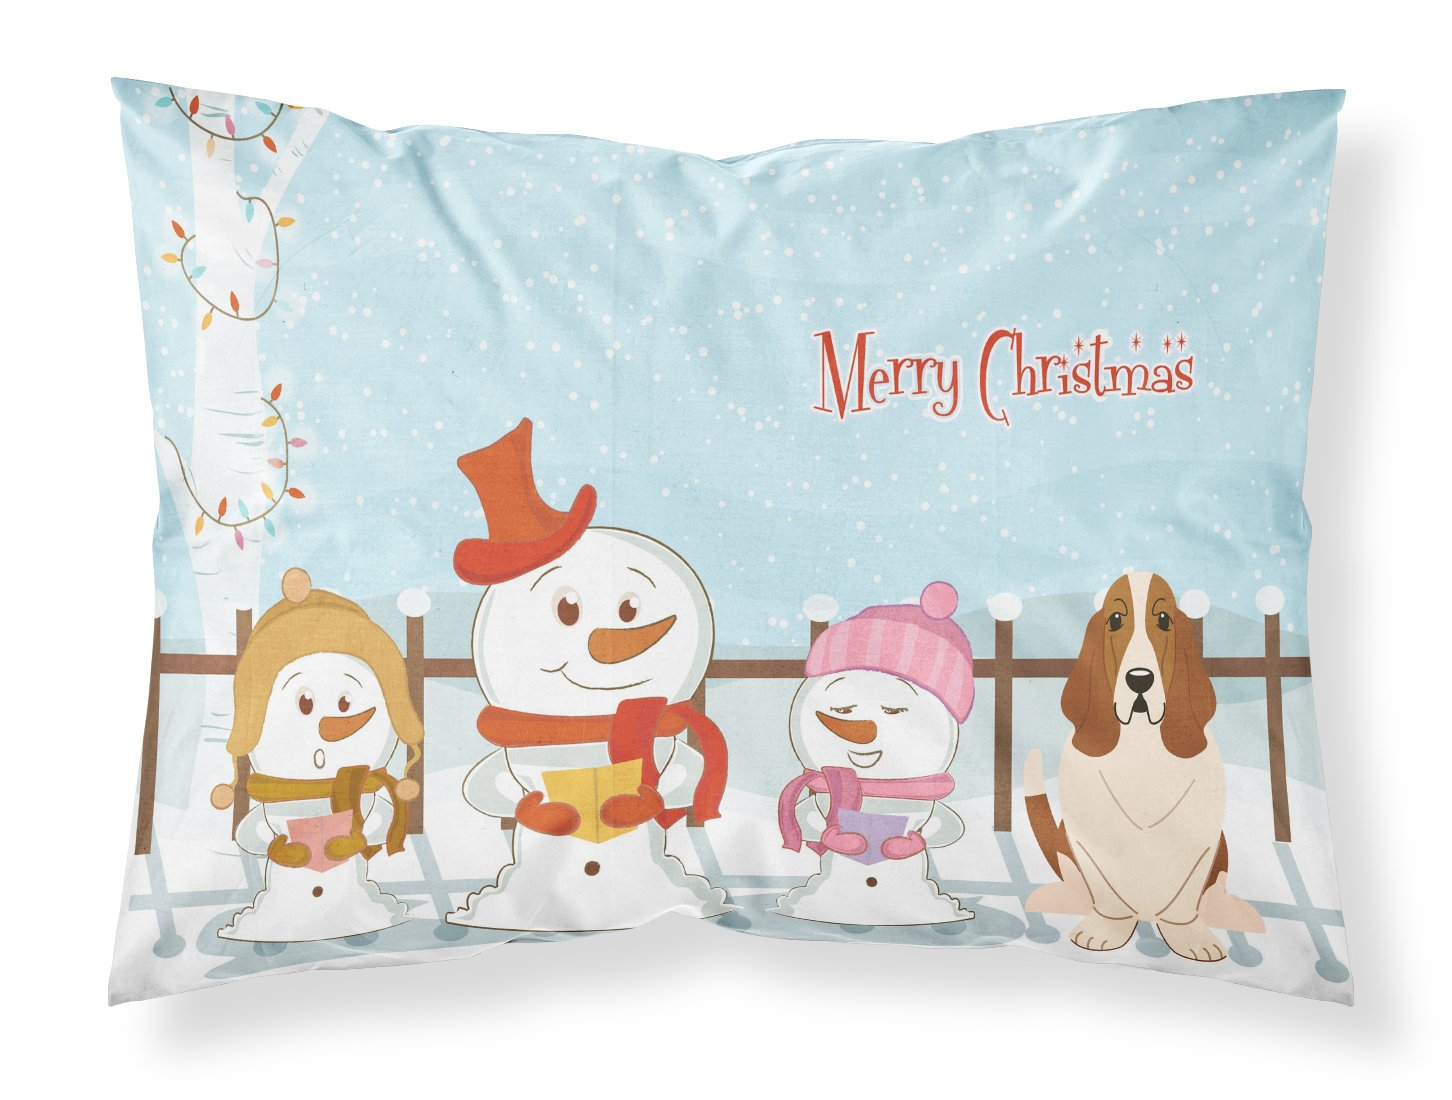 Carolines Treasures Merry Christmas Carolers Basset Hound Fabric Standard Pillowcase BB2352PILLOWCASE Multicolor